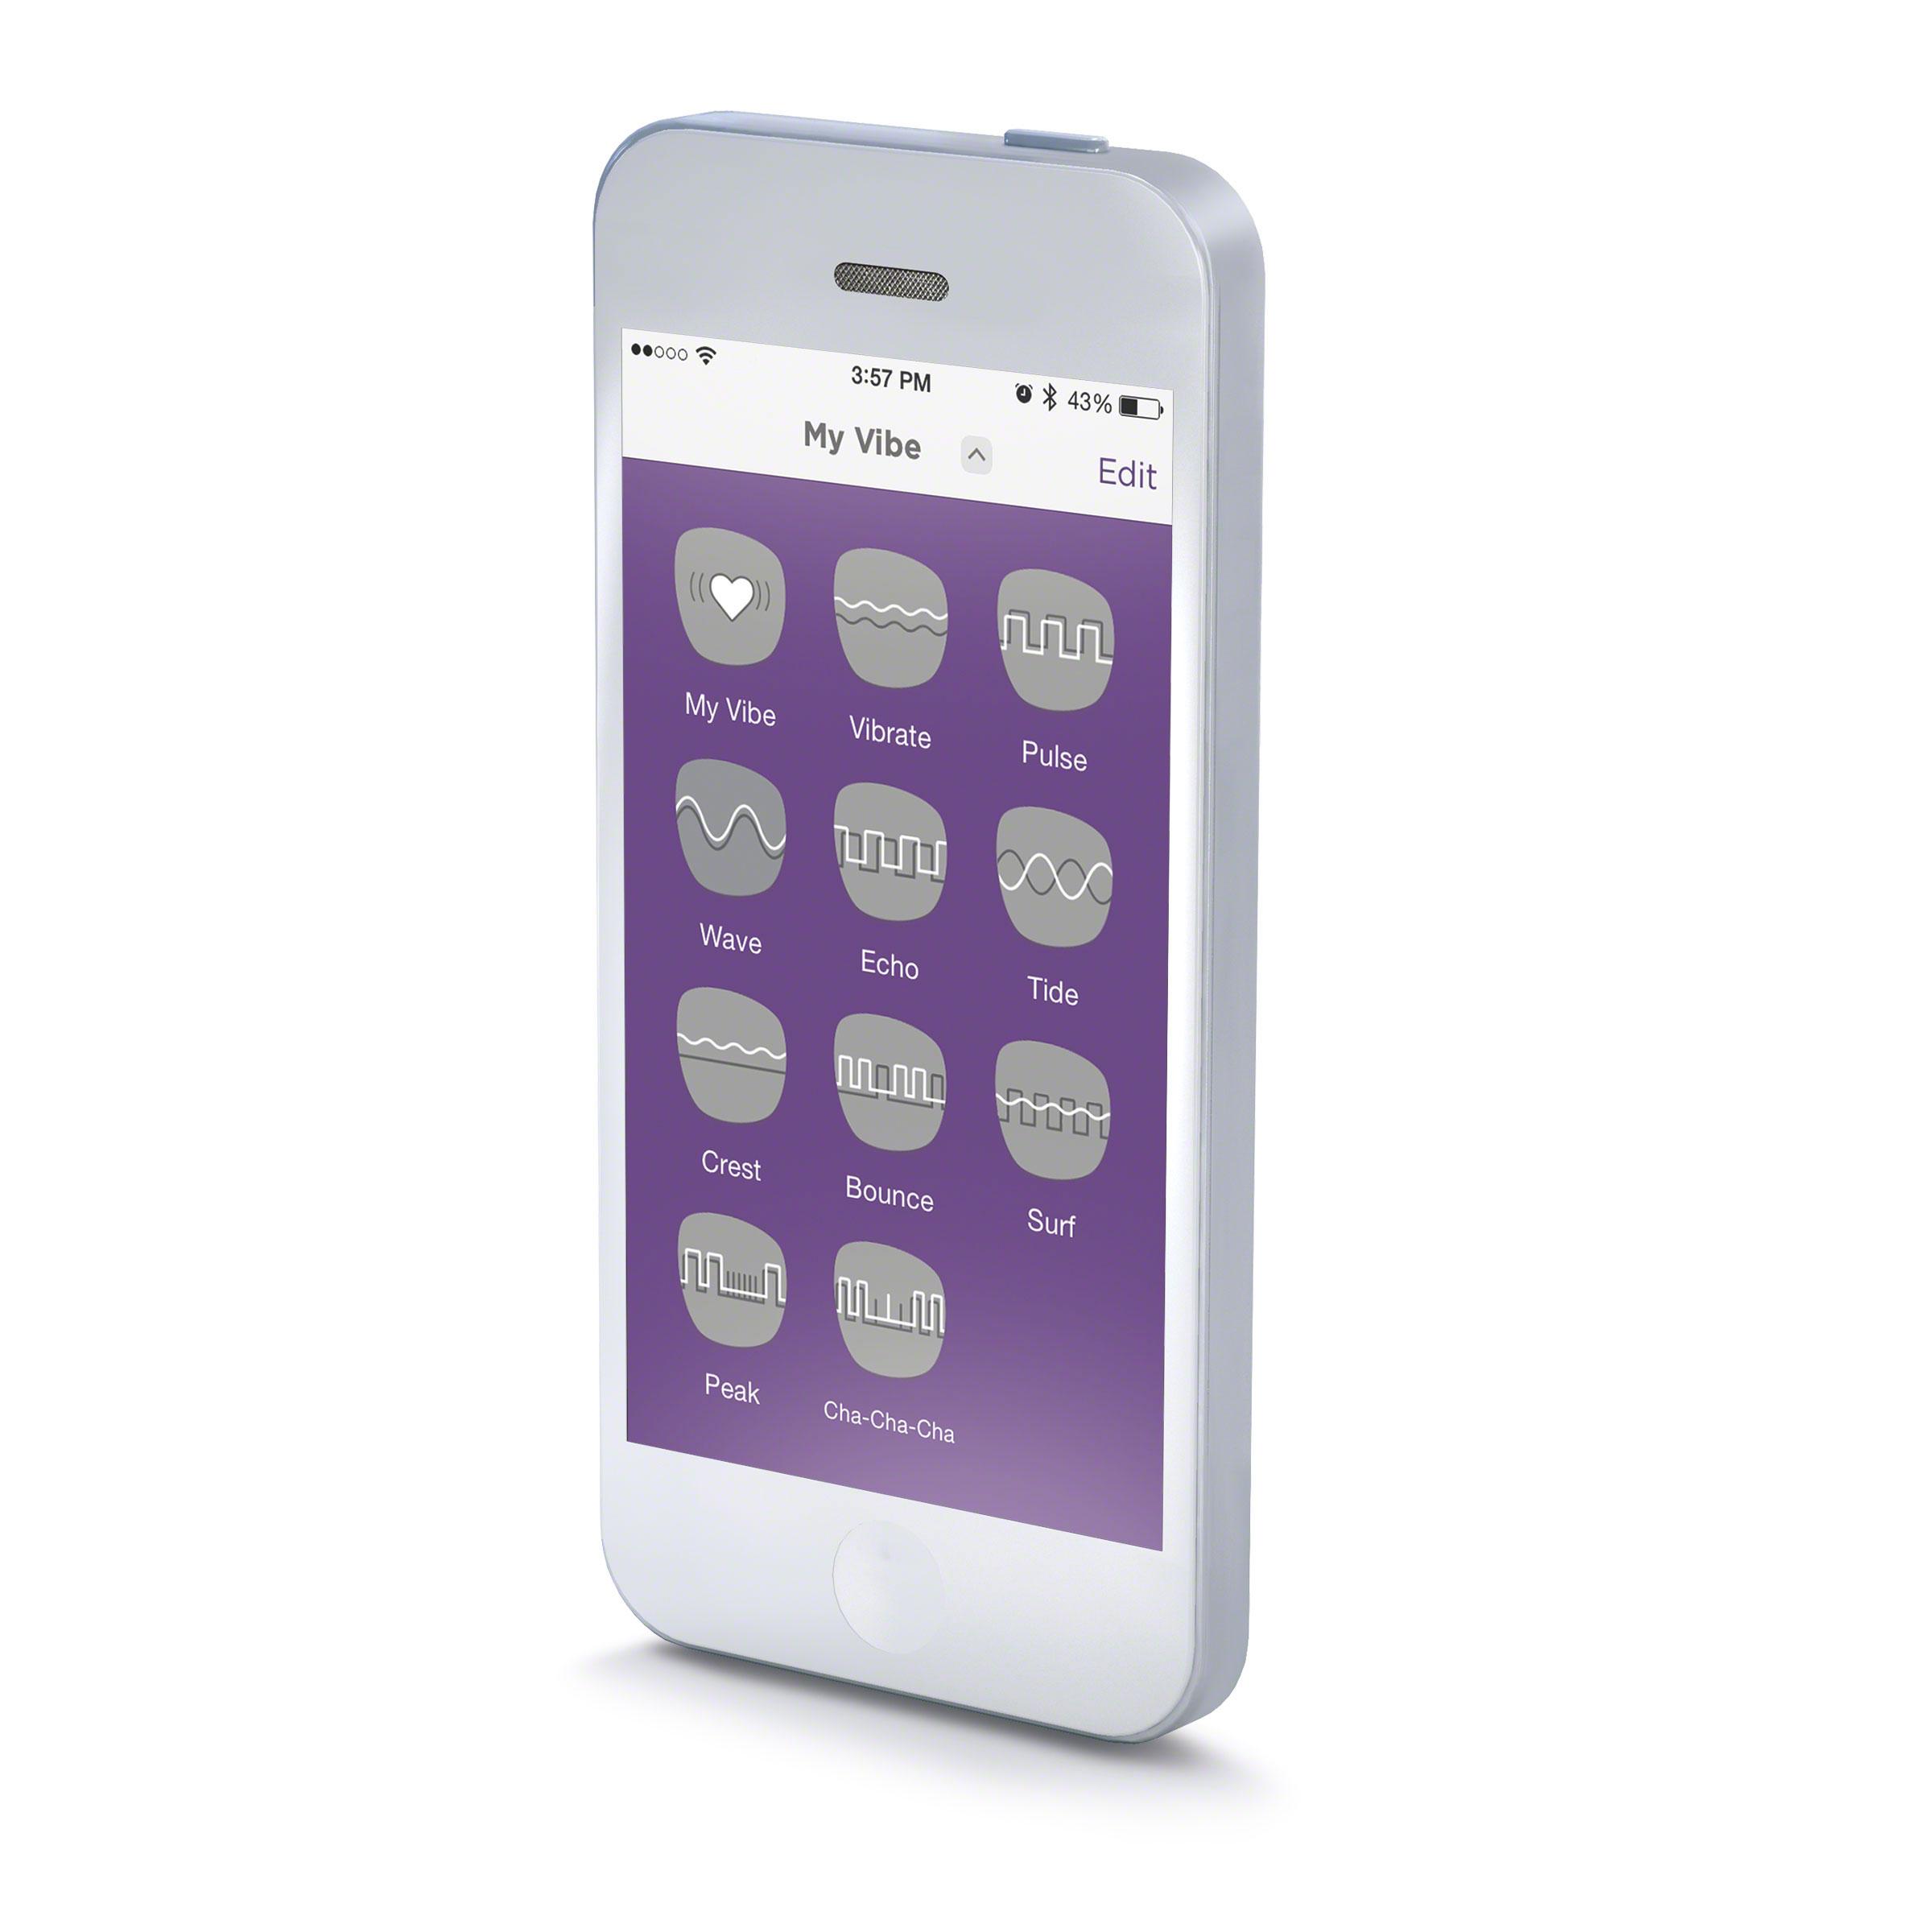 we-vibe-4-plus-couples-vibrator-app-modes-screen.jpg